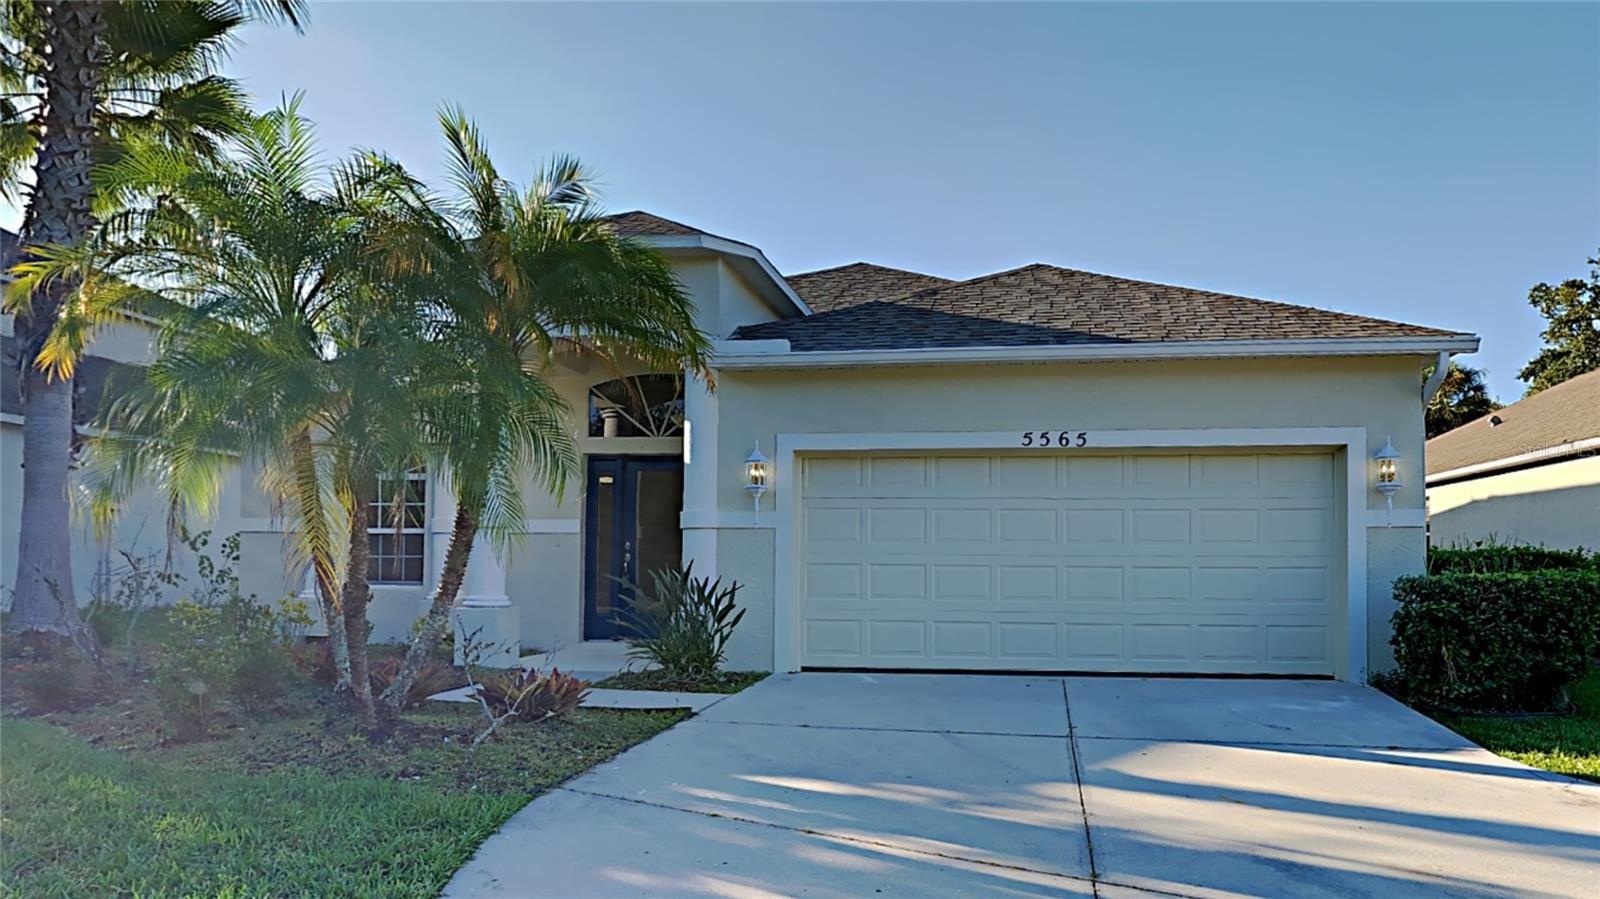 5565 BURNT BRANCH CIRCLE, Sarasota, FL 34232 - #: T3337371